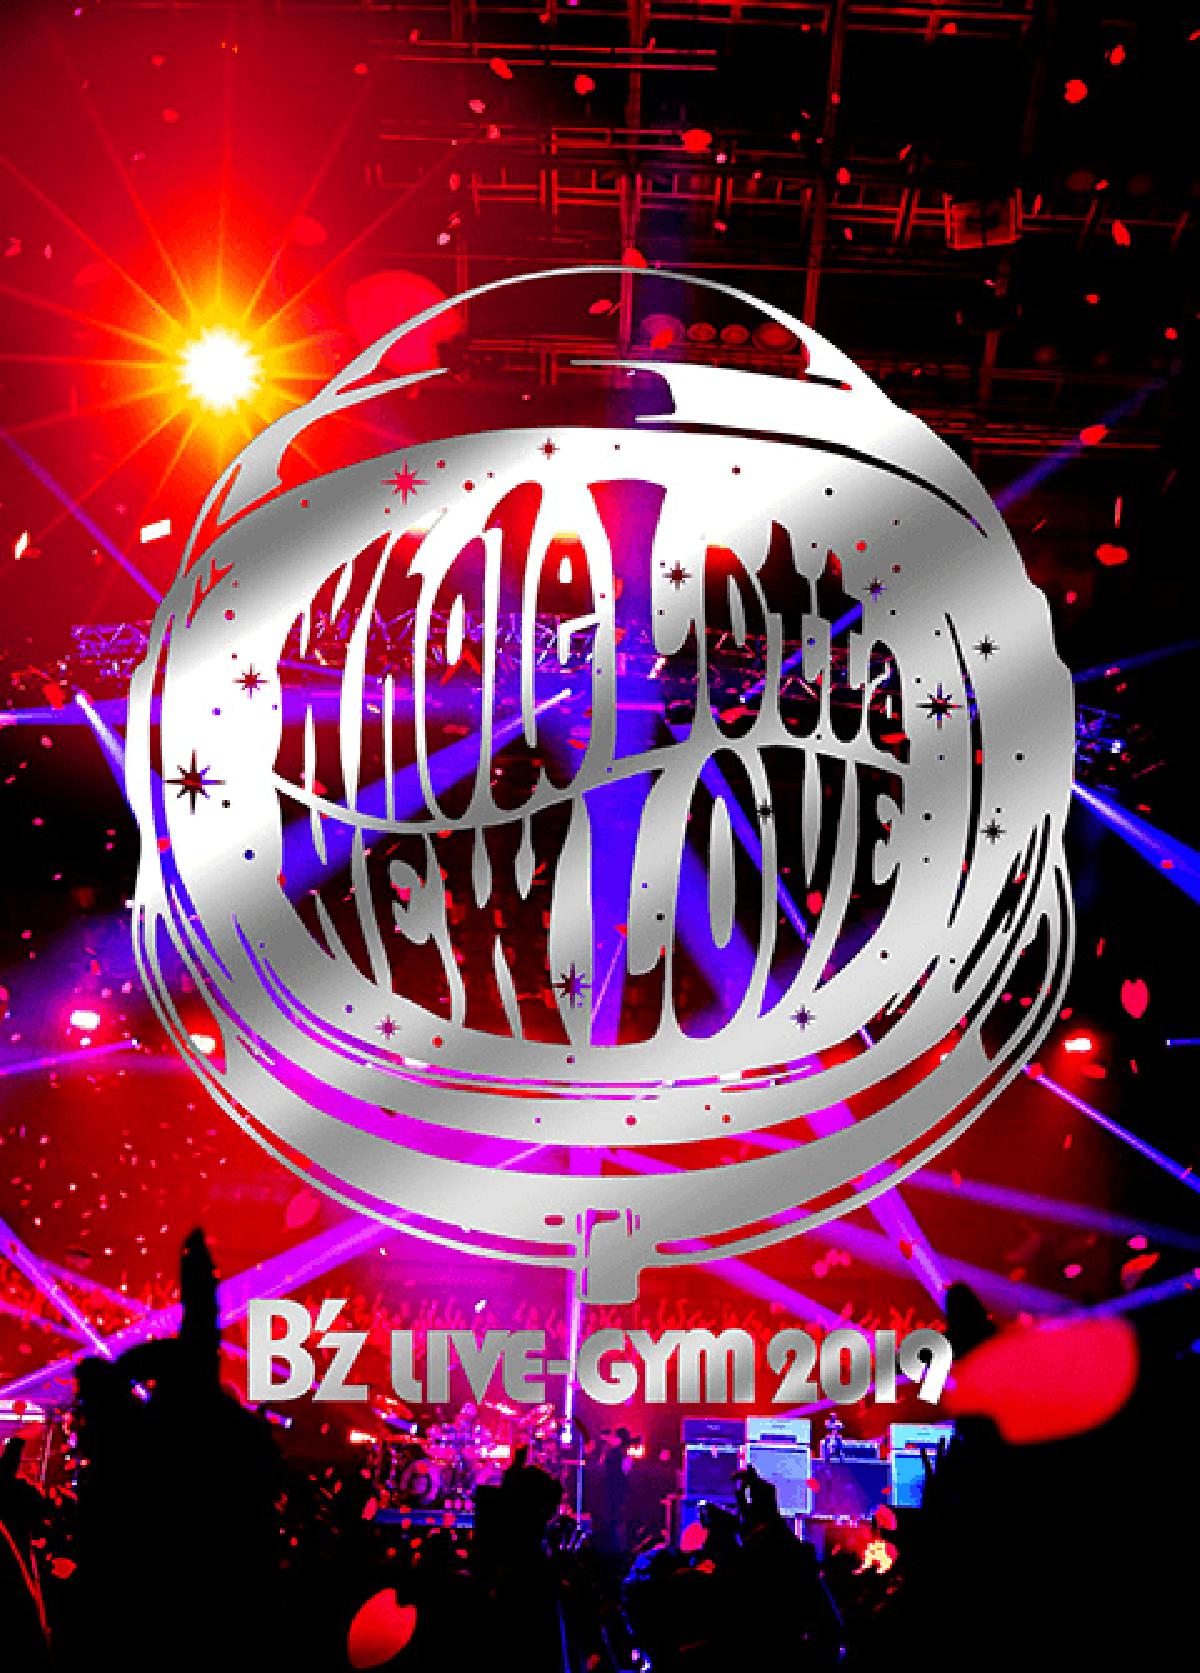 DVD&Blu-ray『B'z LIVE-GYM 2019 -Whole Lotta NEW LOVE-』